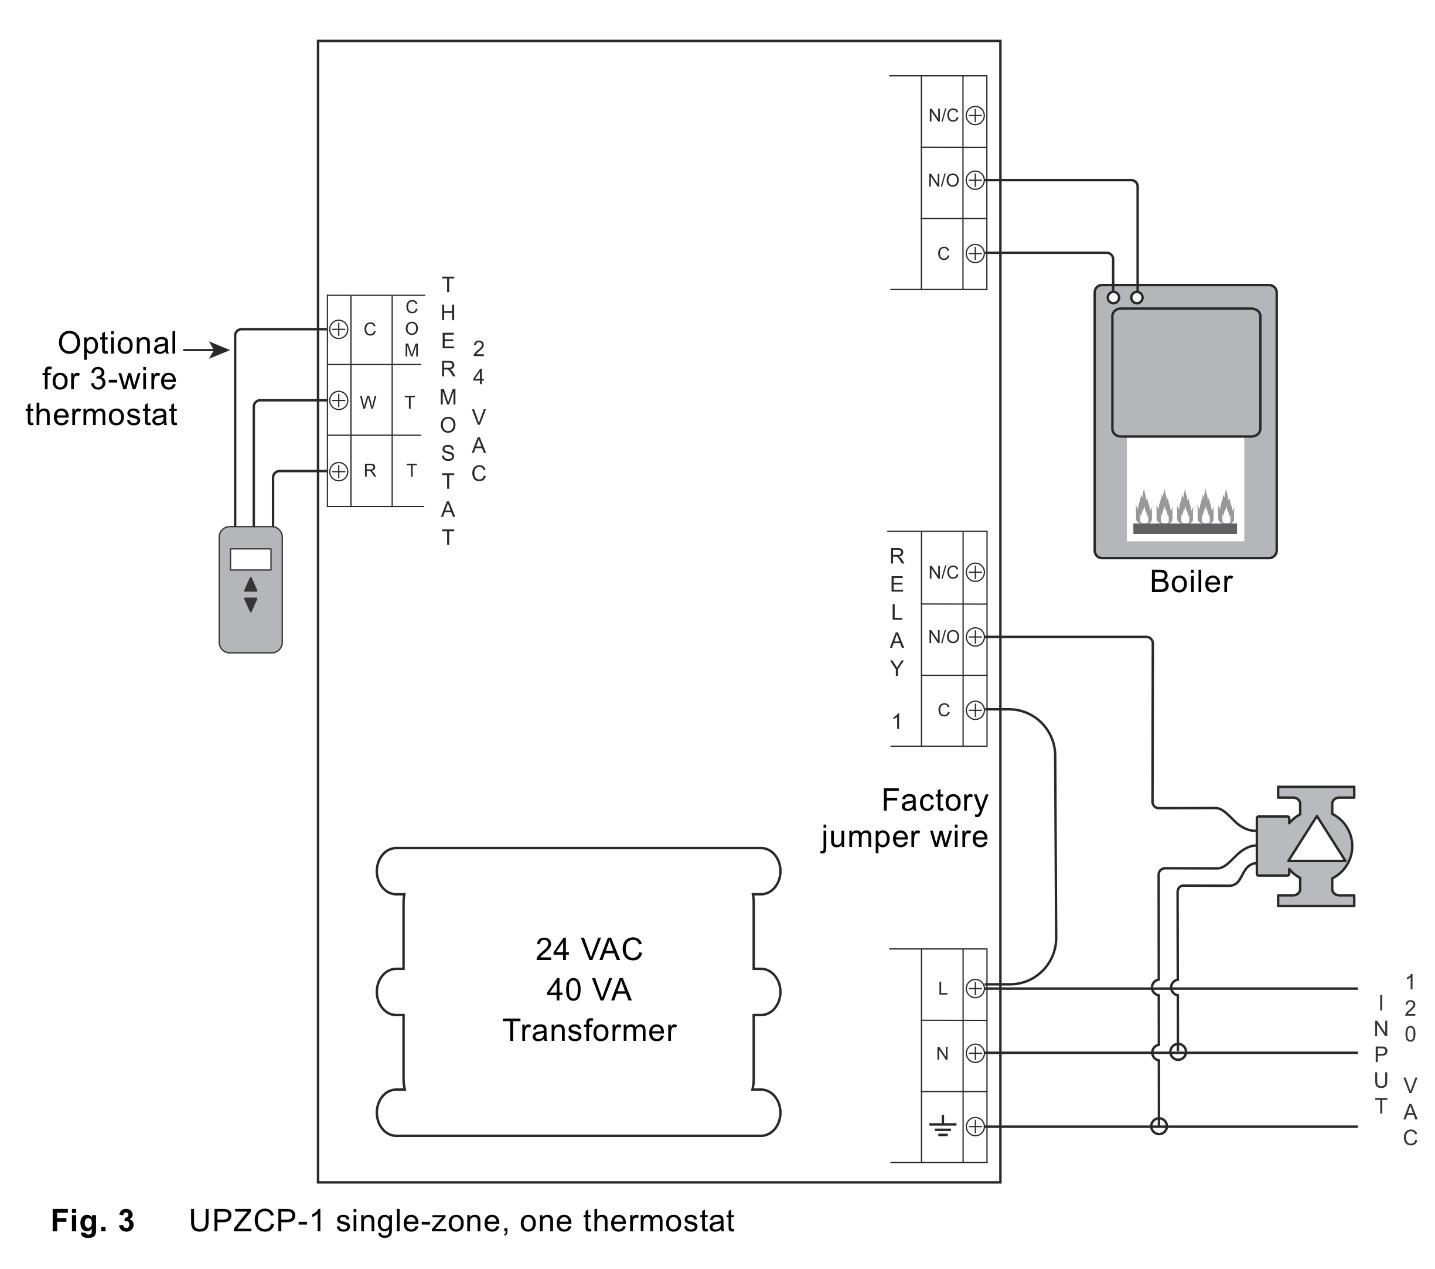 hight resolution of taco 007 zf5 9 wiring diagram wiring diagram taco circulator